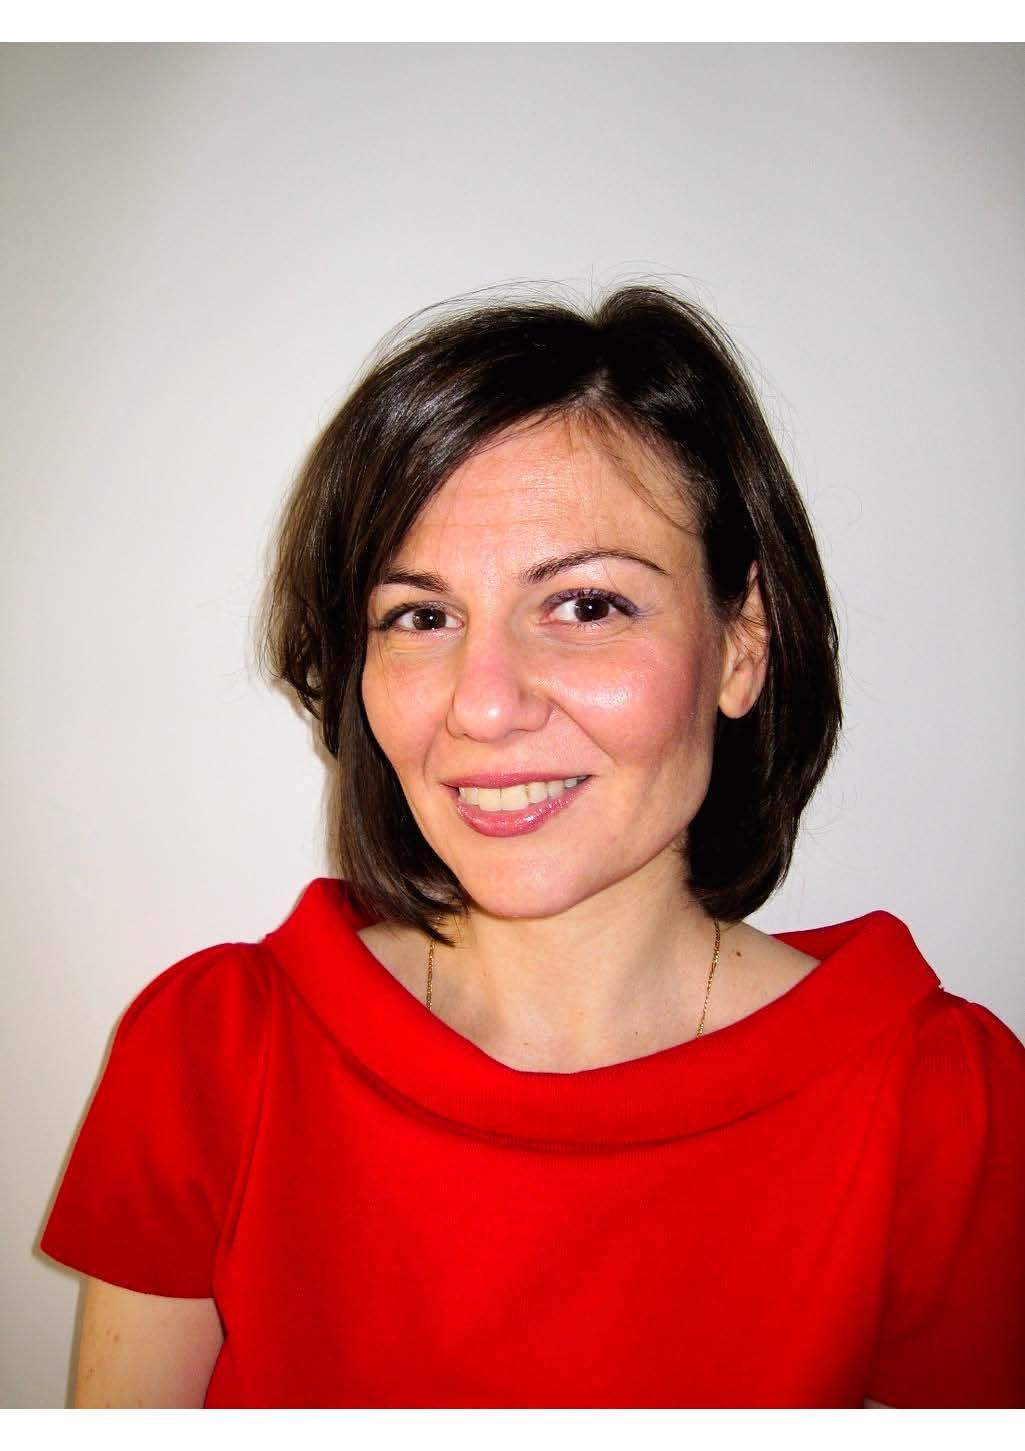 Maria Varaki, University of Helsinki